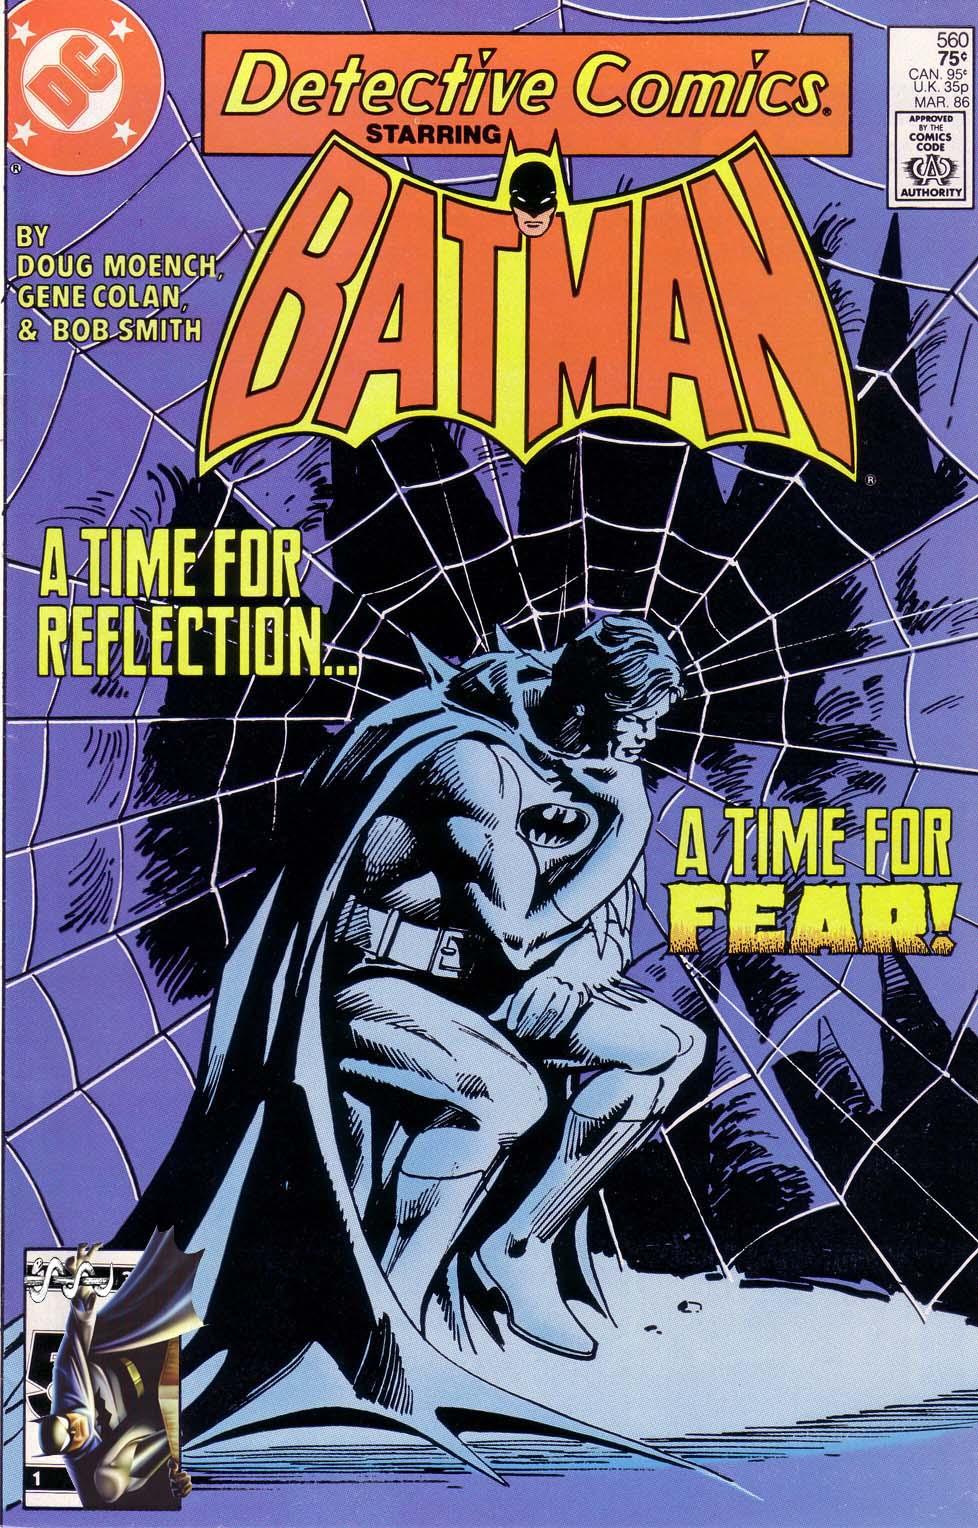 Detective Comics (1937) 560 Page 1